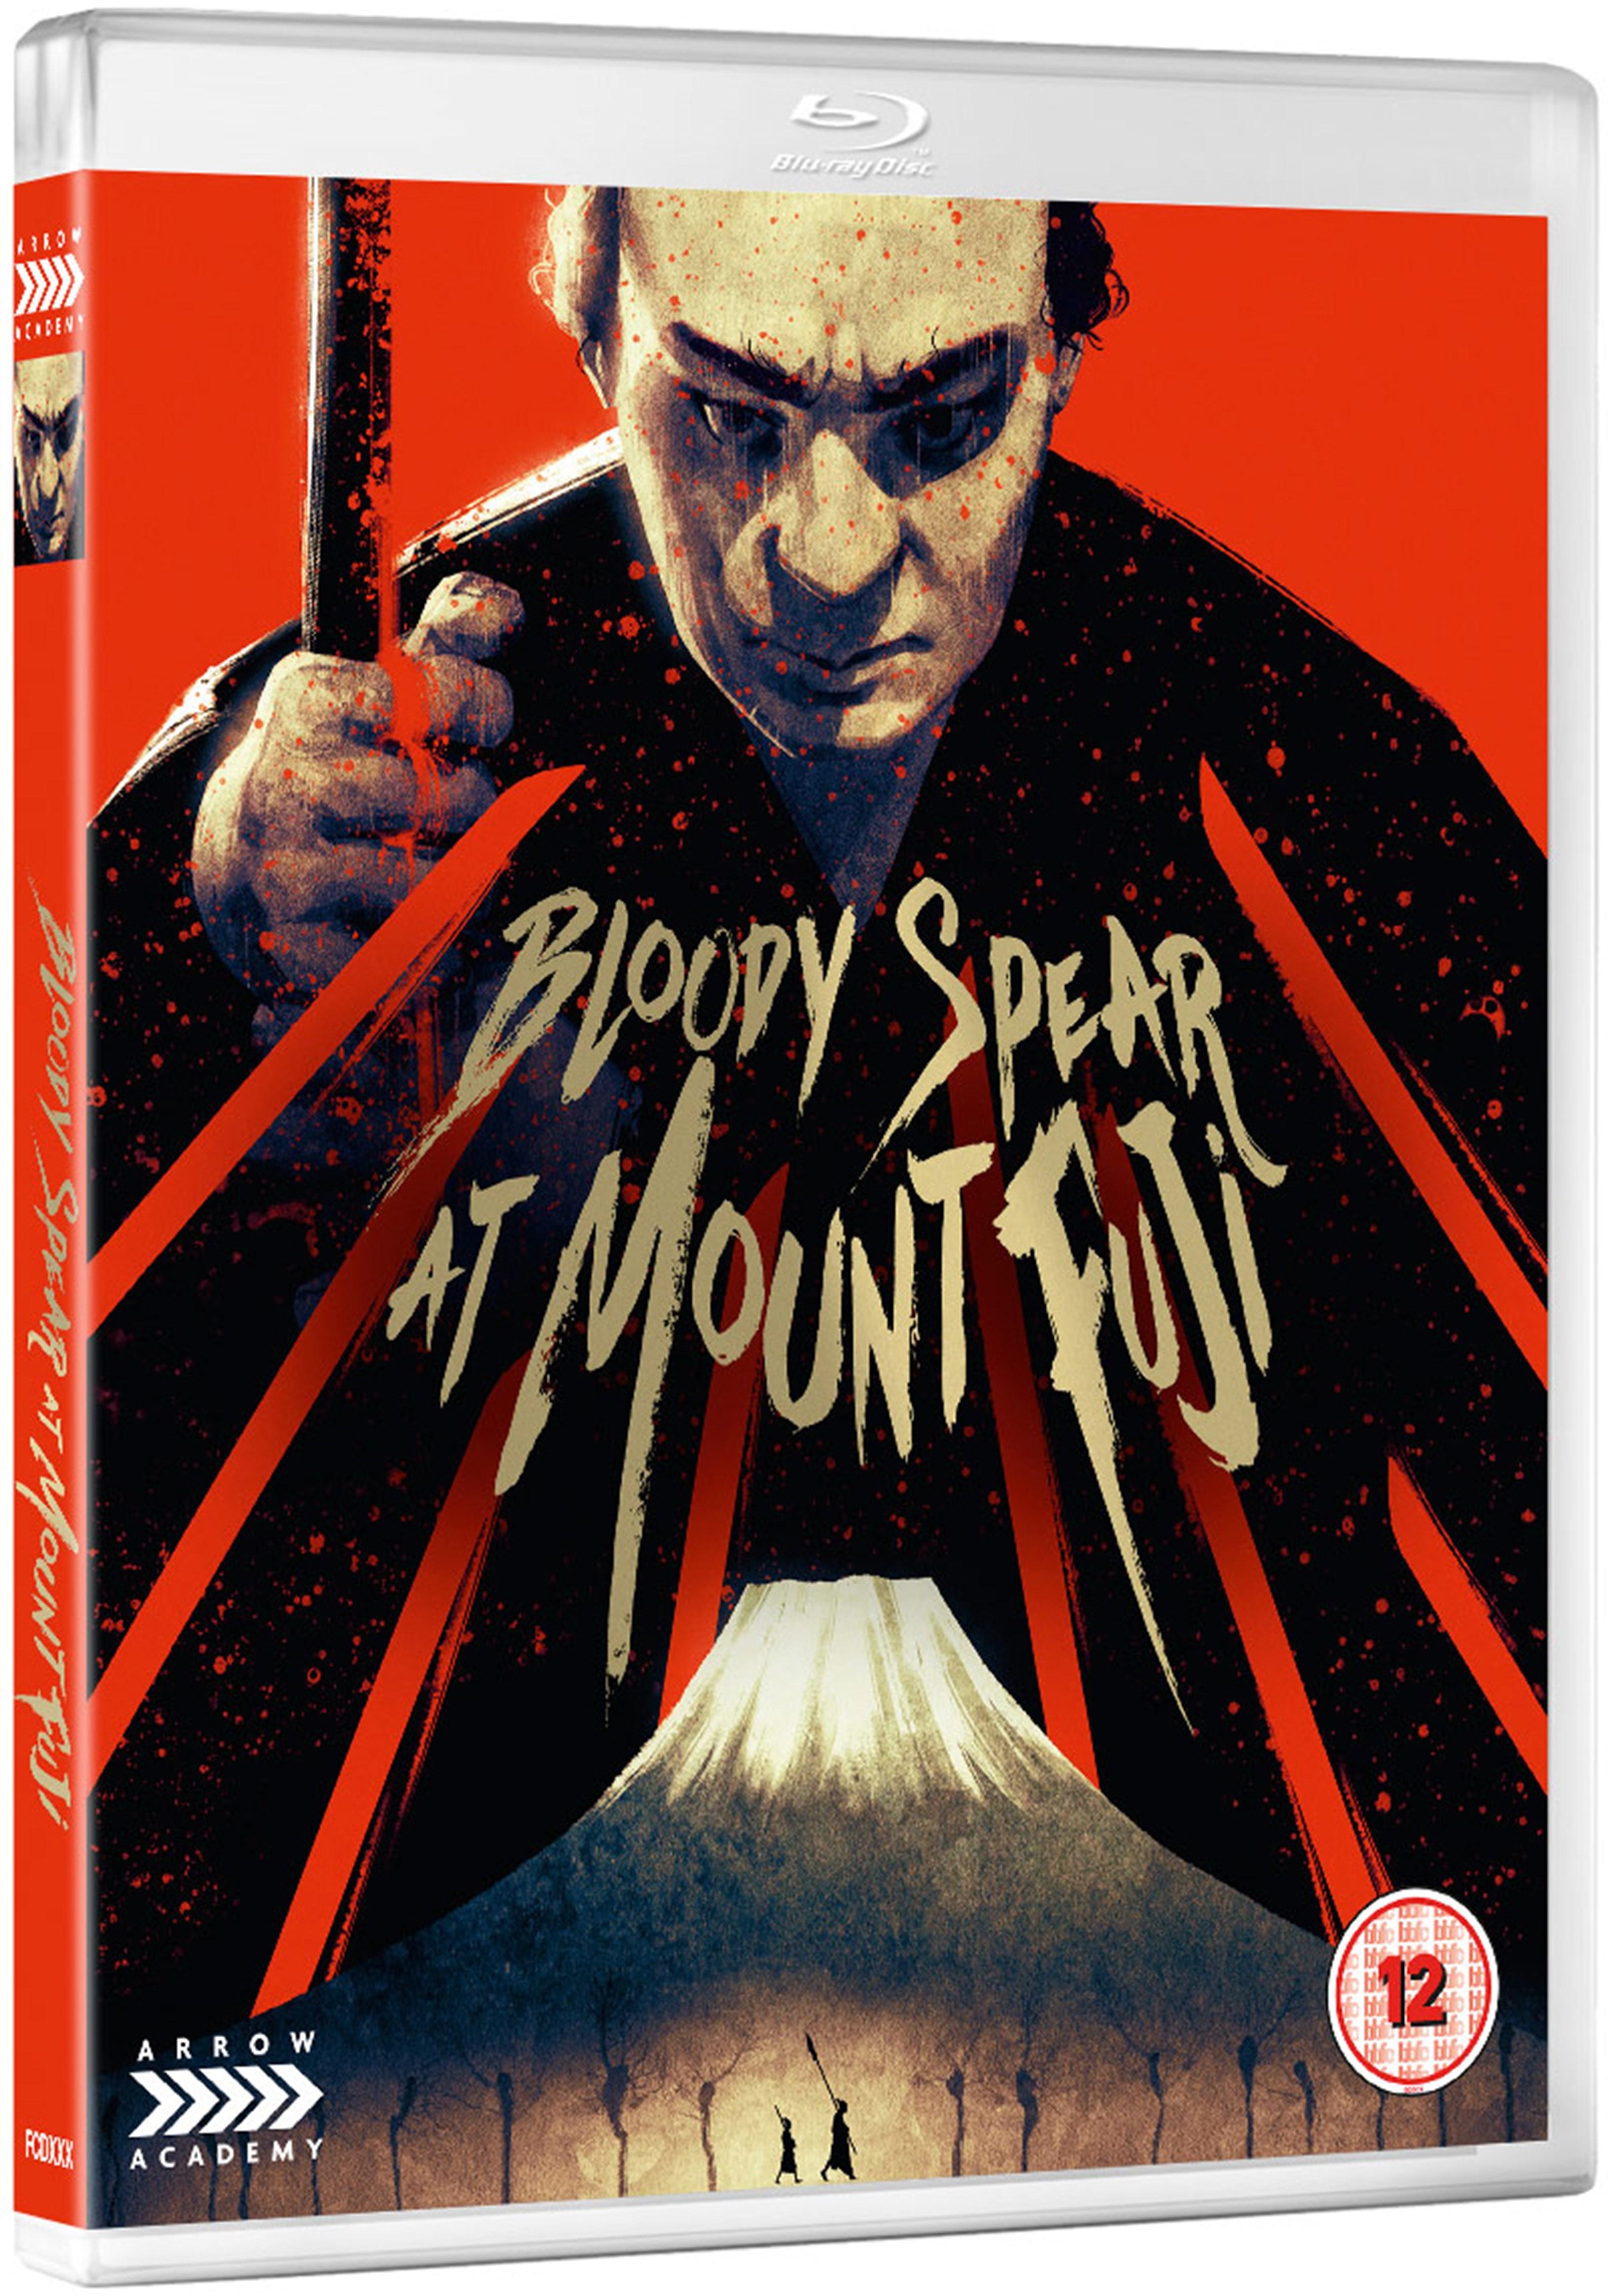 Bloody Spear at Mount Fuji - 2